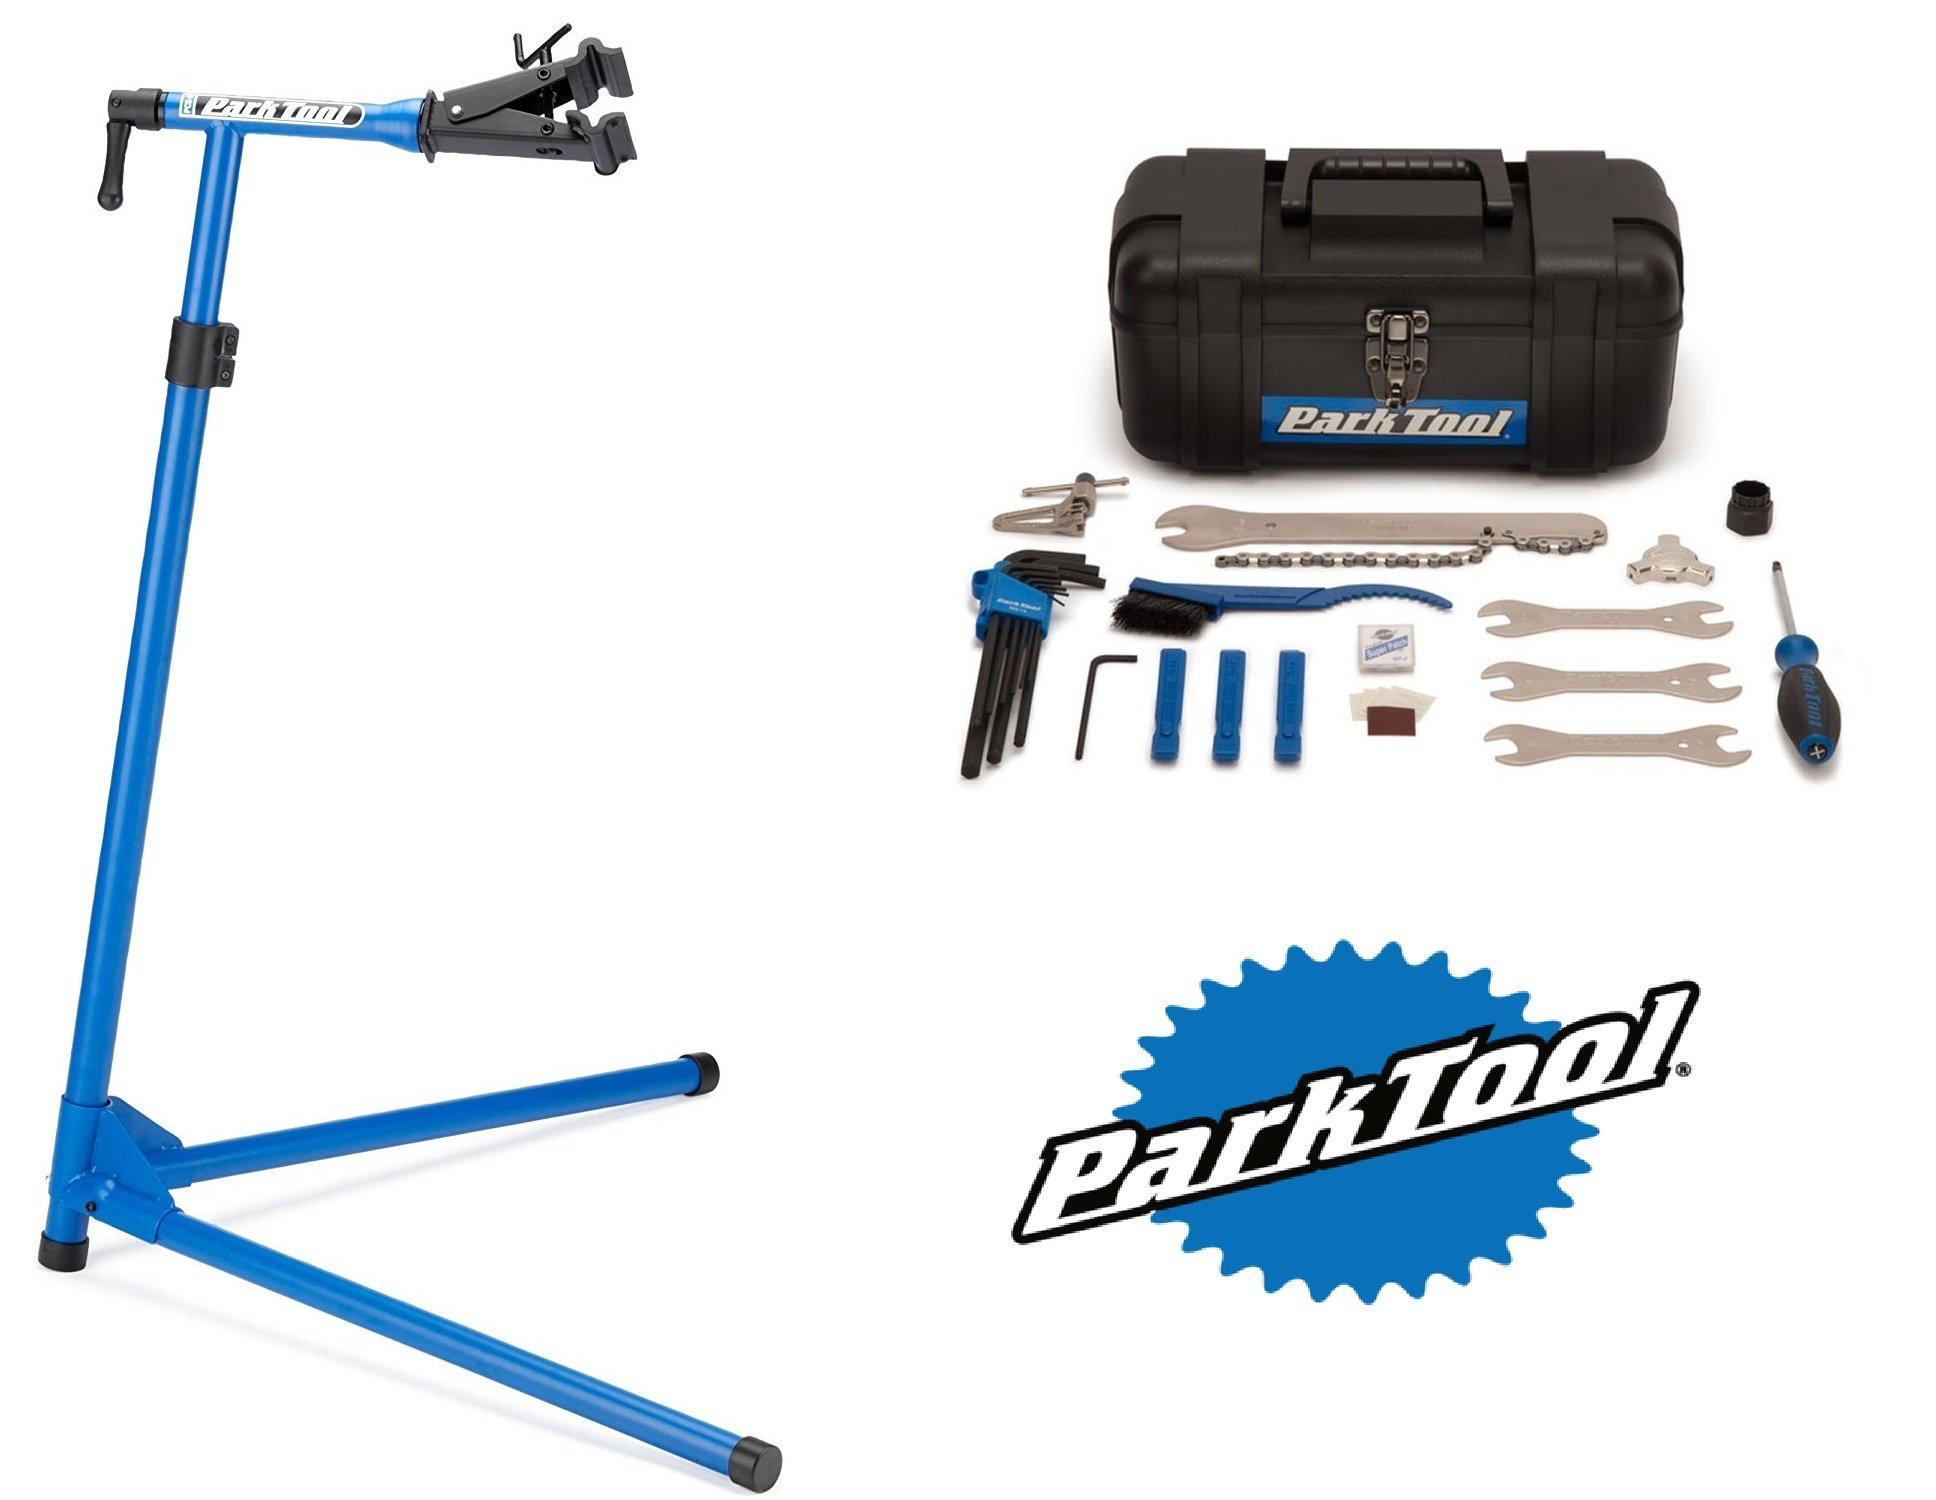 Park Tool PCS-9 Home Mechanic Repair Stand + Park Tool SK-2 Home Mechanic Starter Kit Bundle